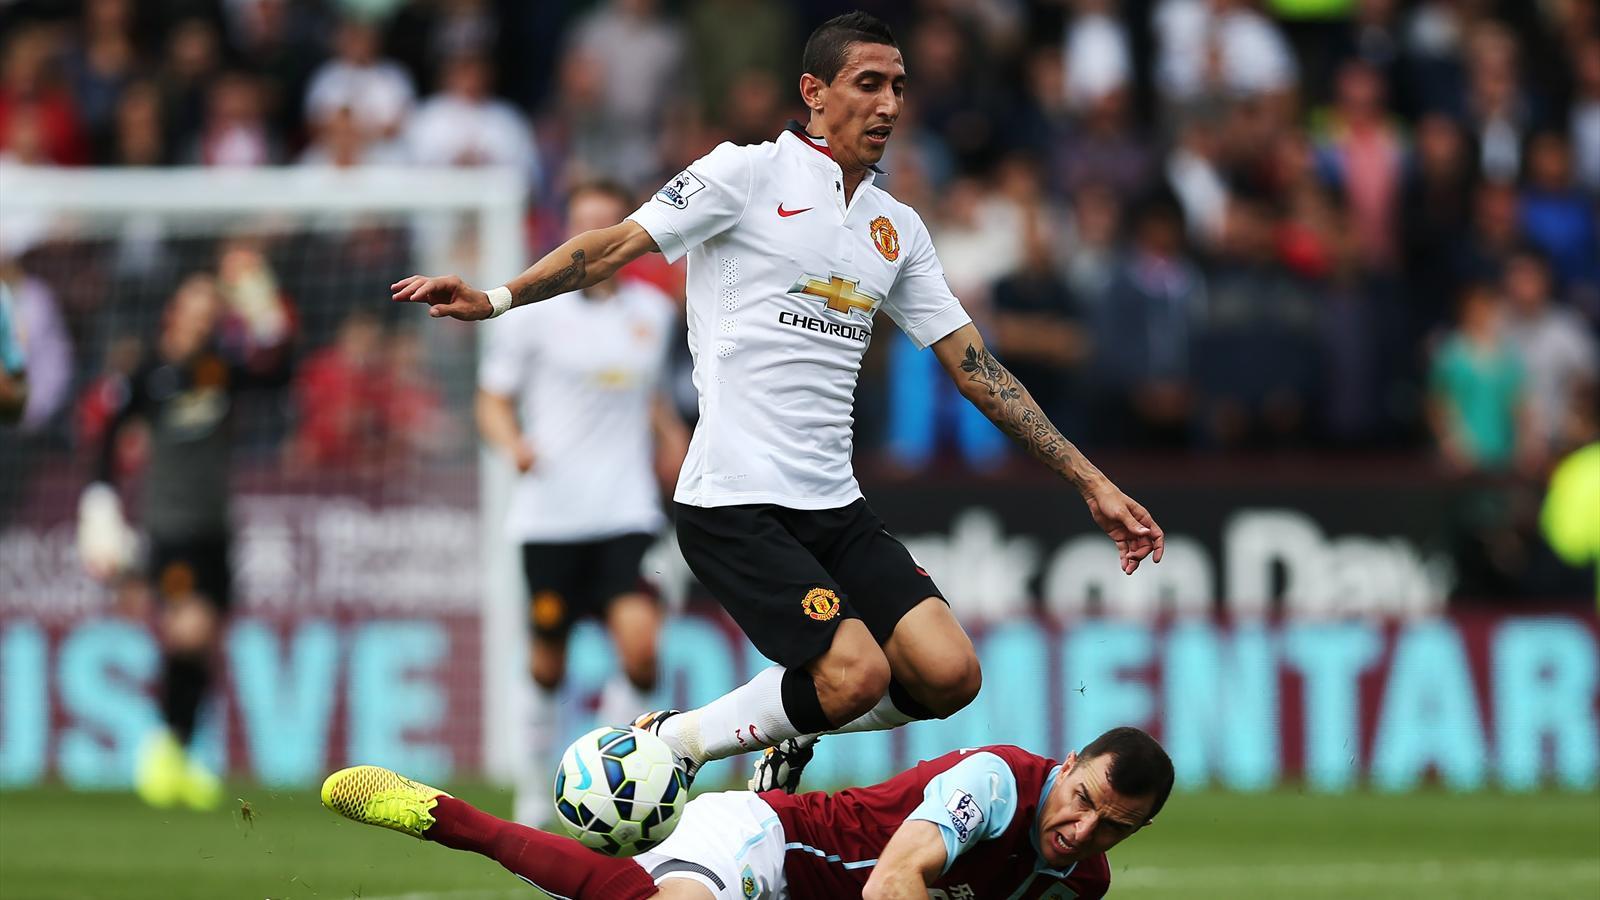 Burnley 0-0 Manchester United : Même avec Di Maria, Manchester n